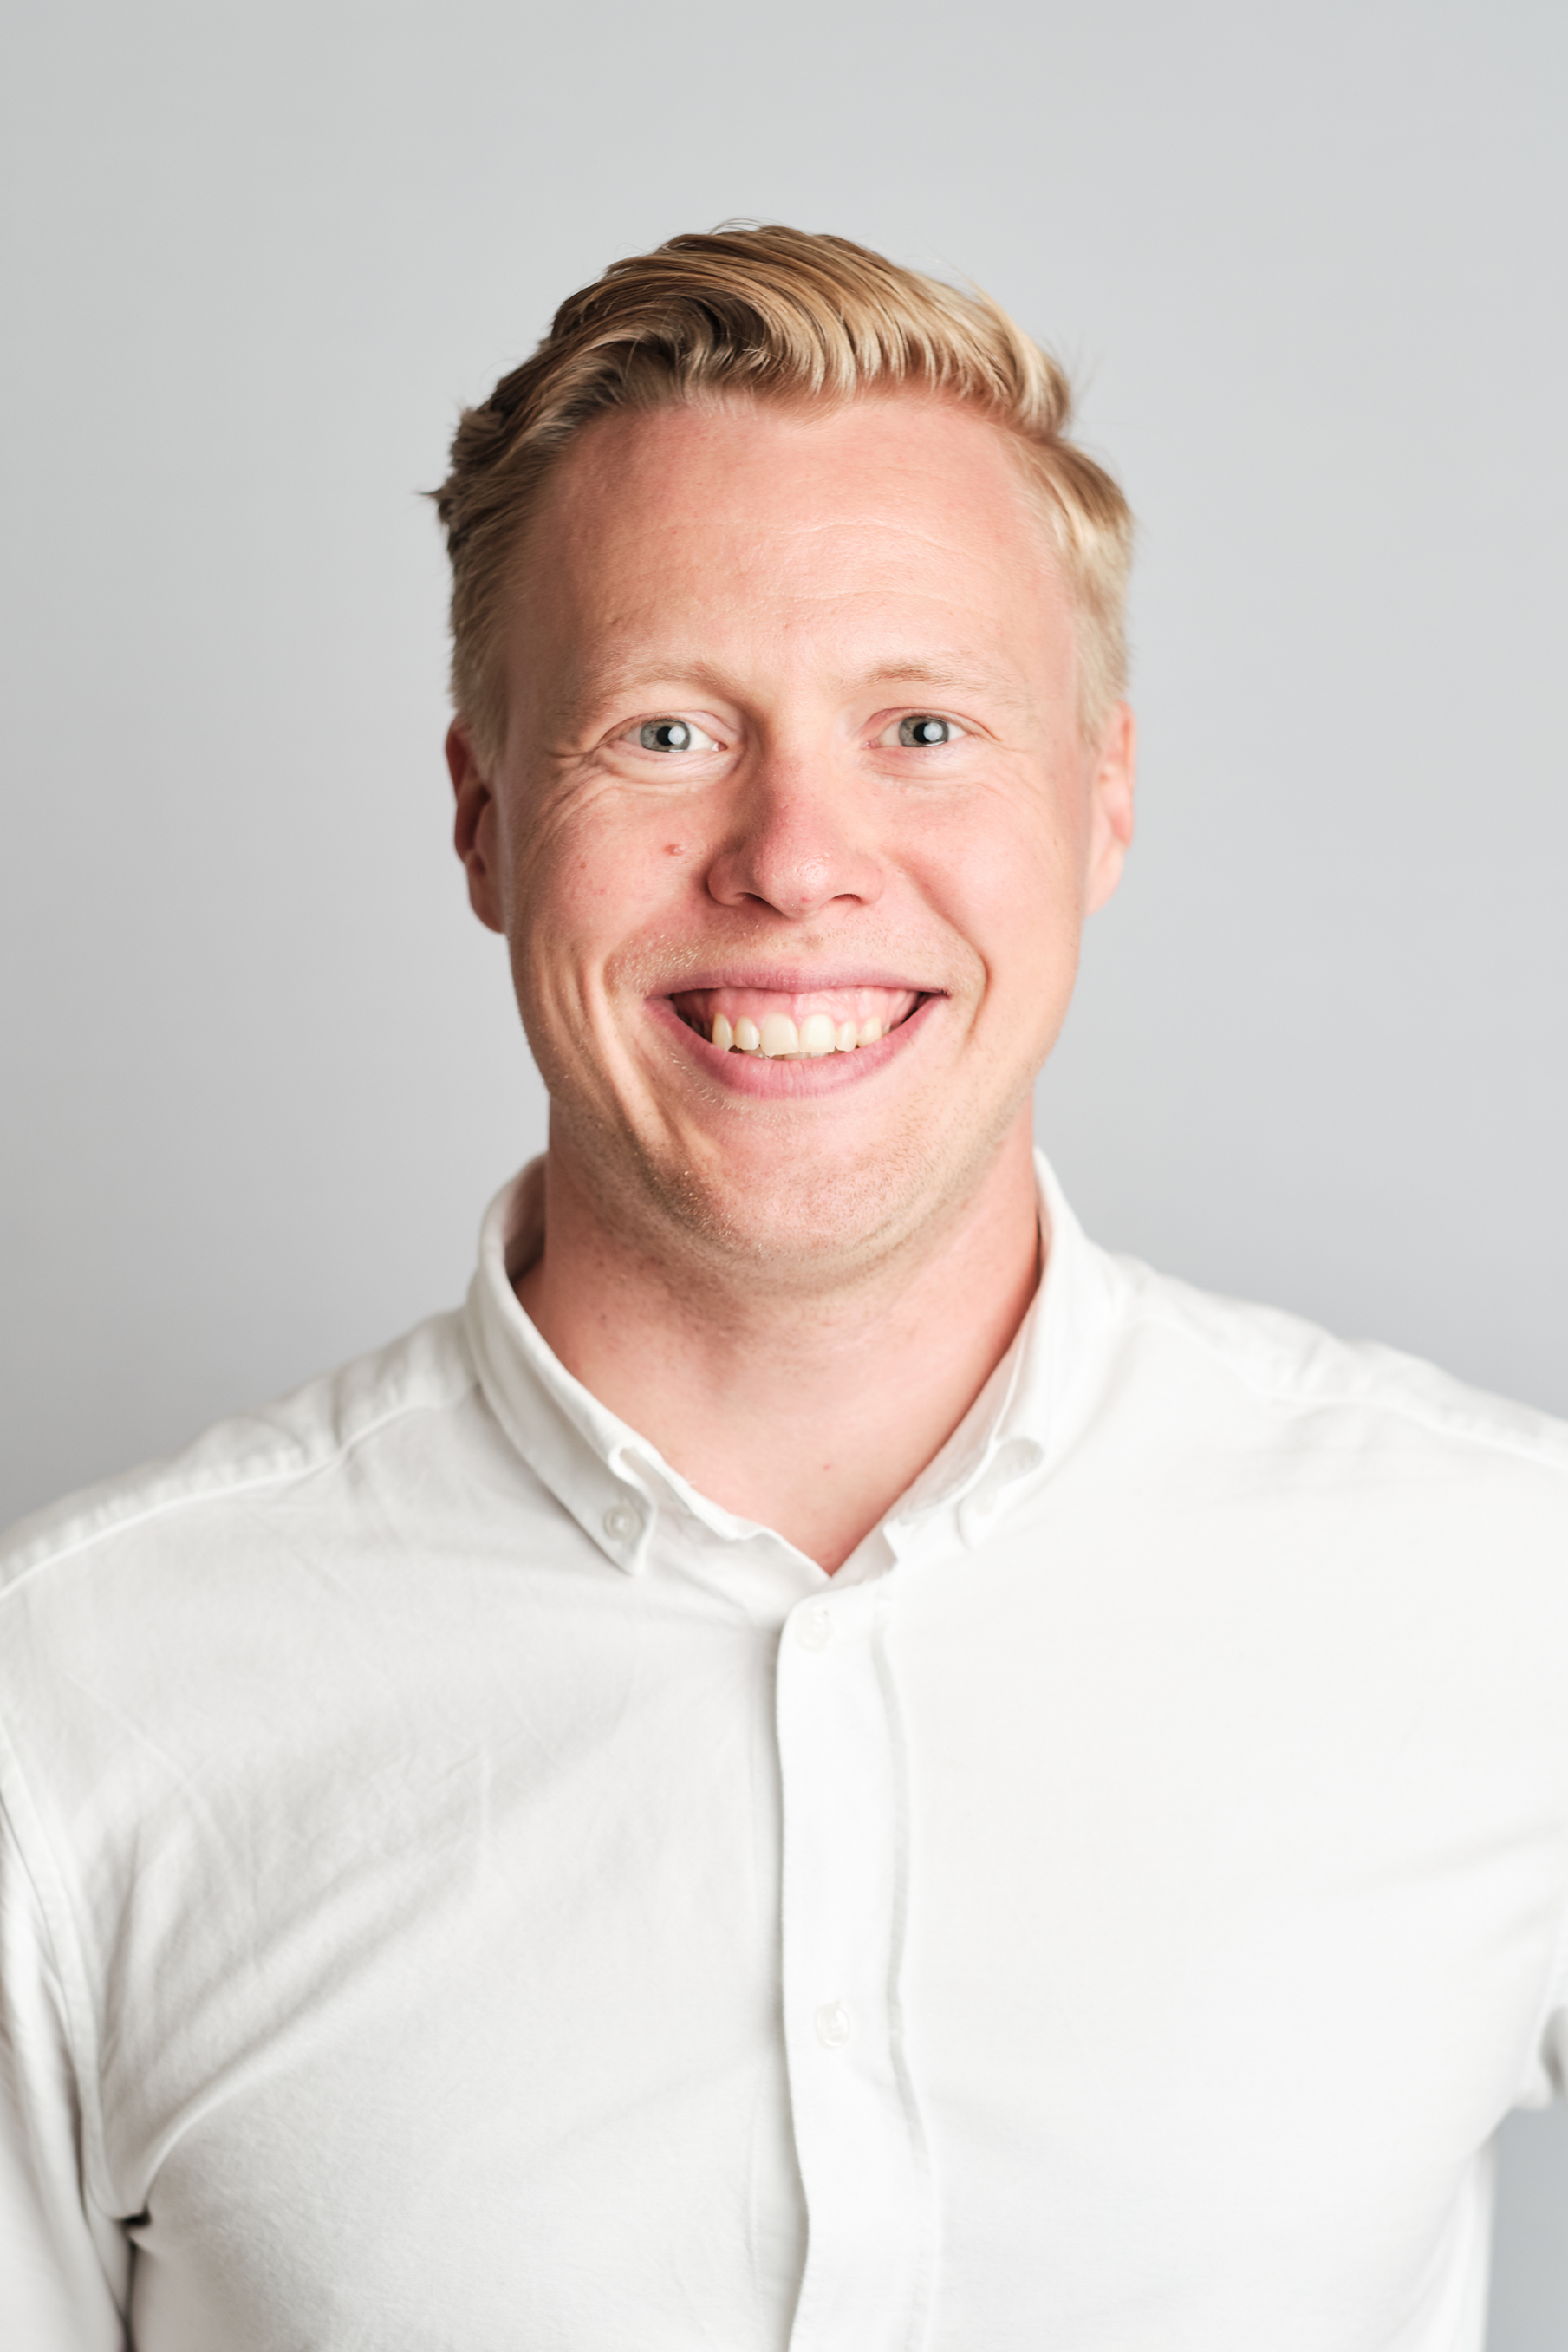 Janne Valtakari